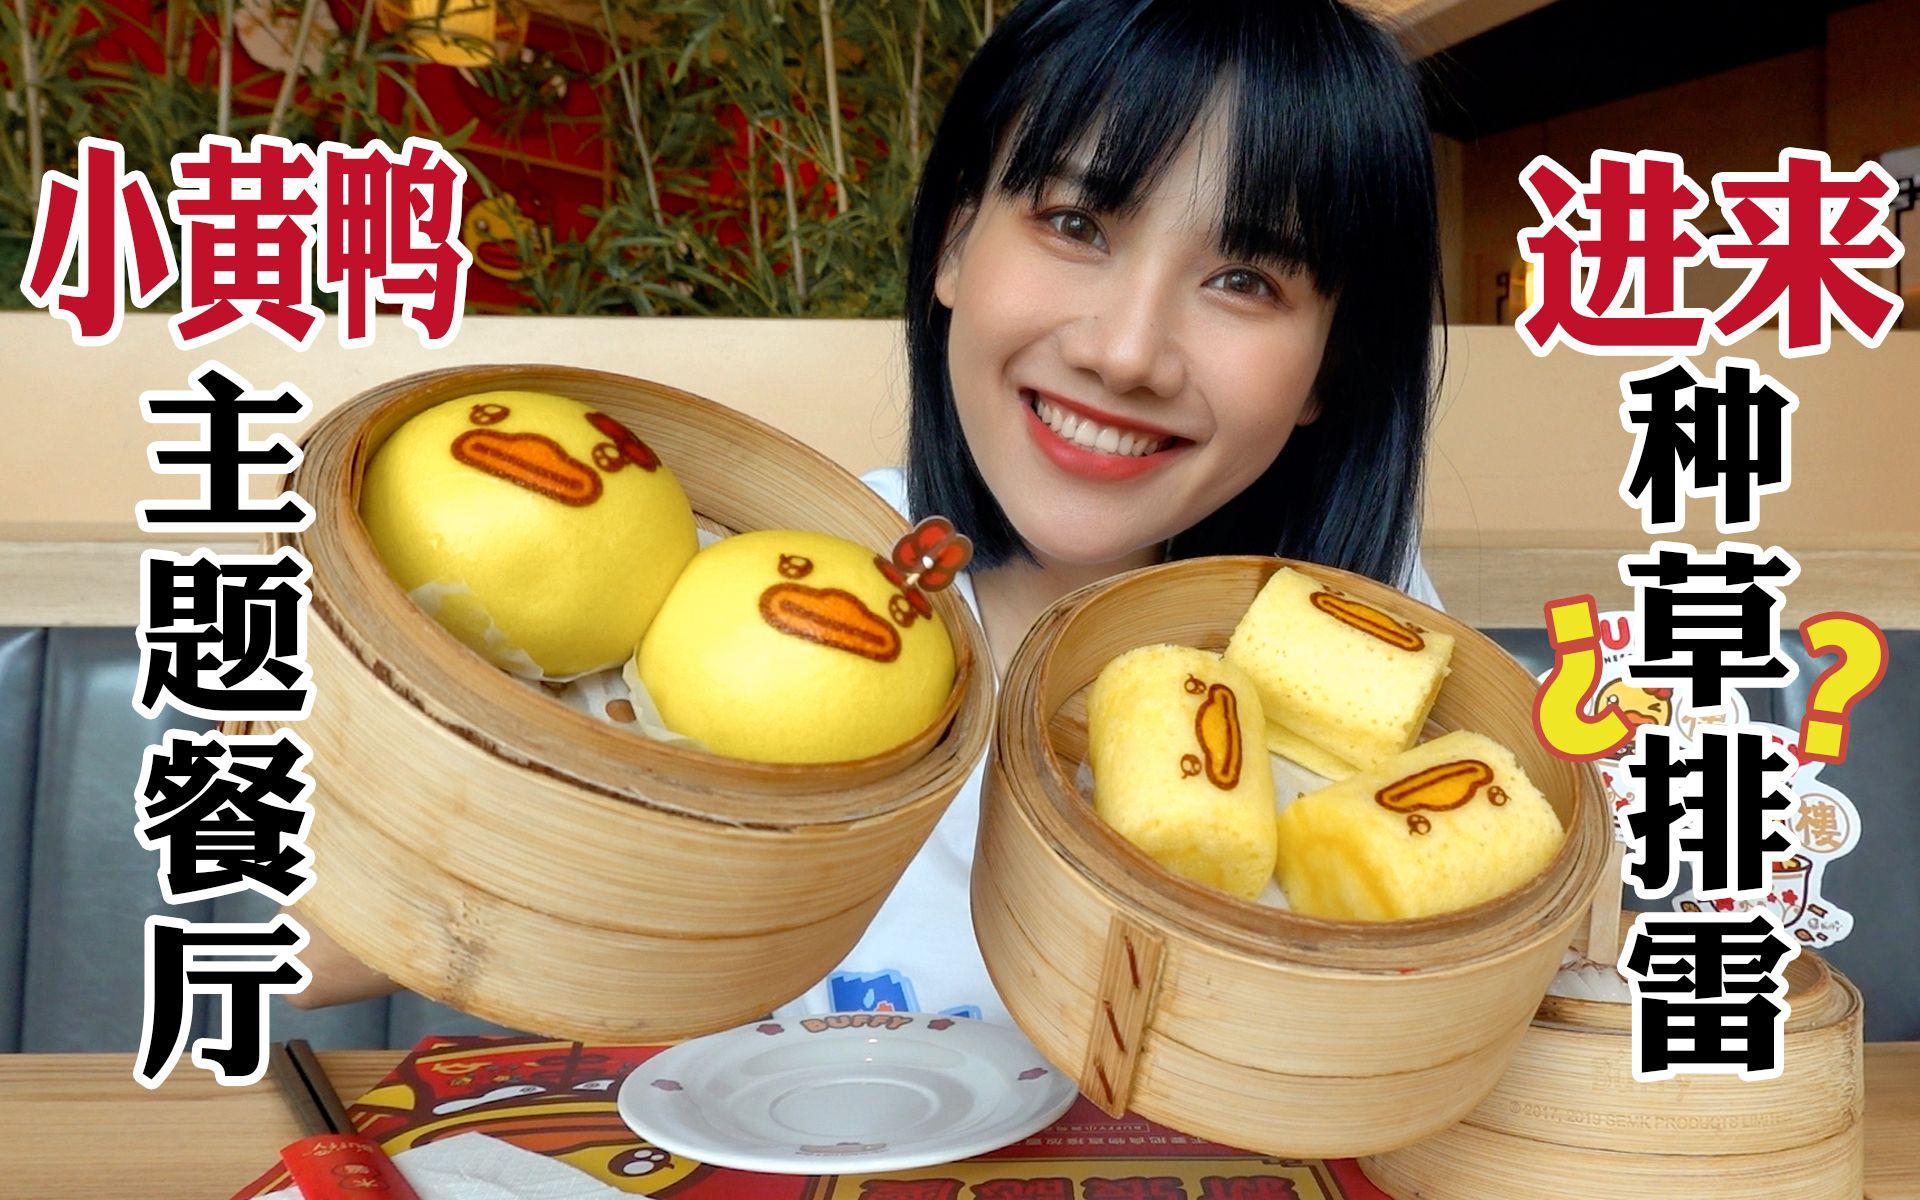 Q萌小黄鸭茶餐! 种草还是拔草? | 成都美食探店